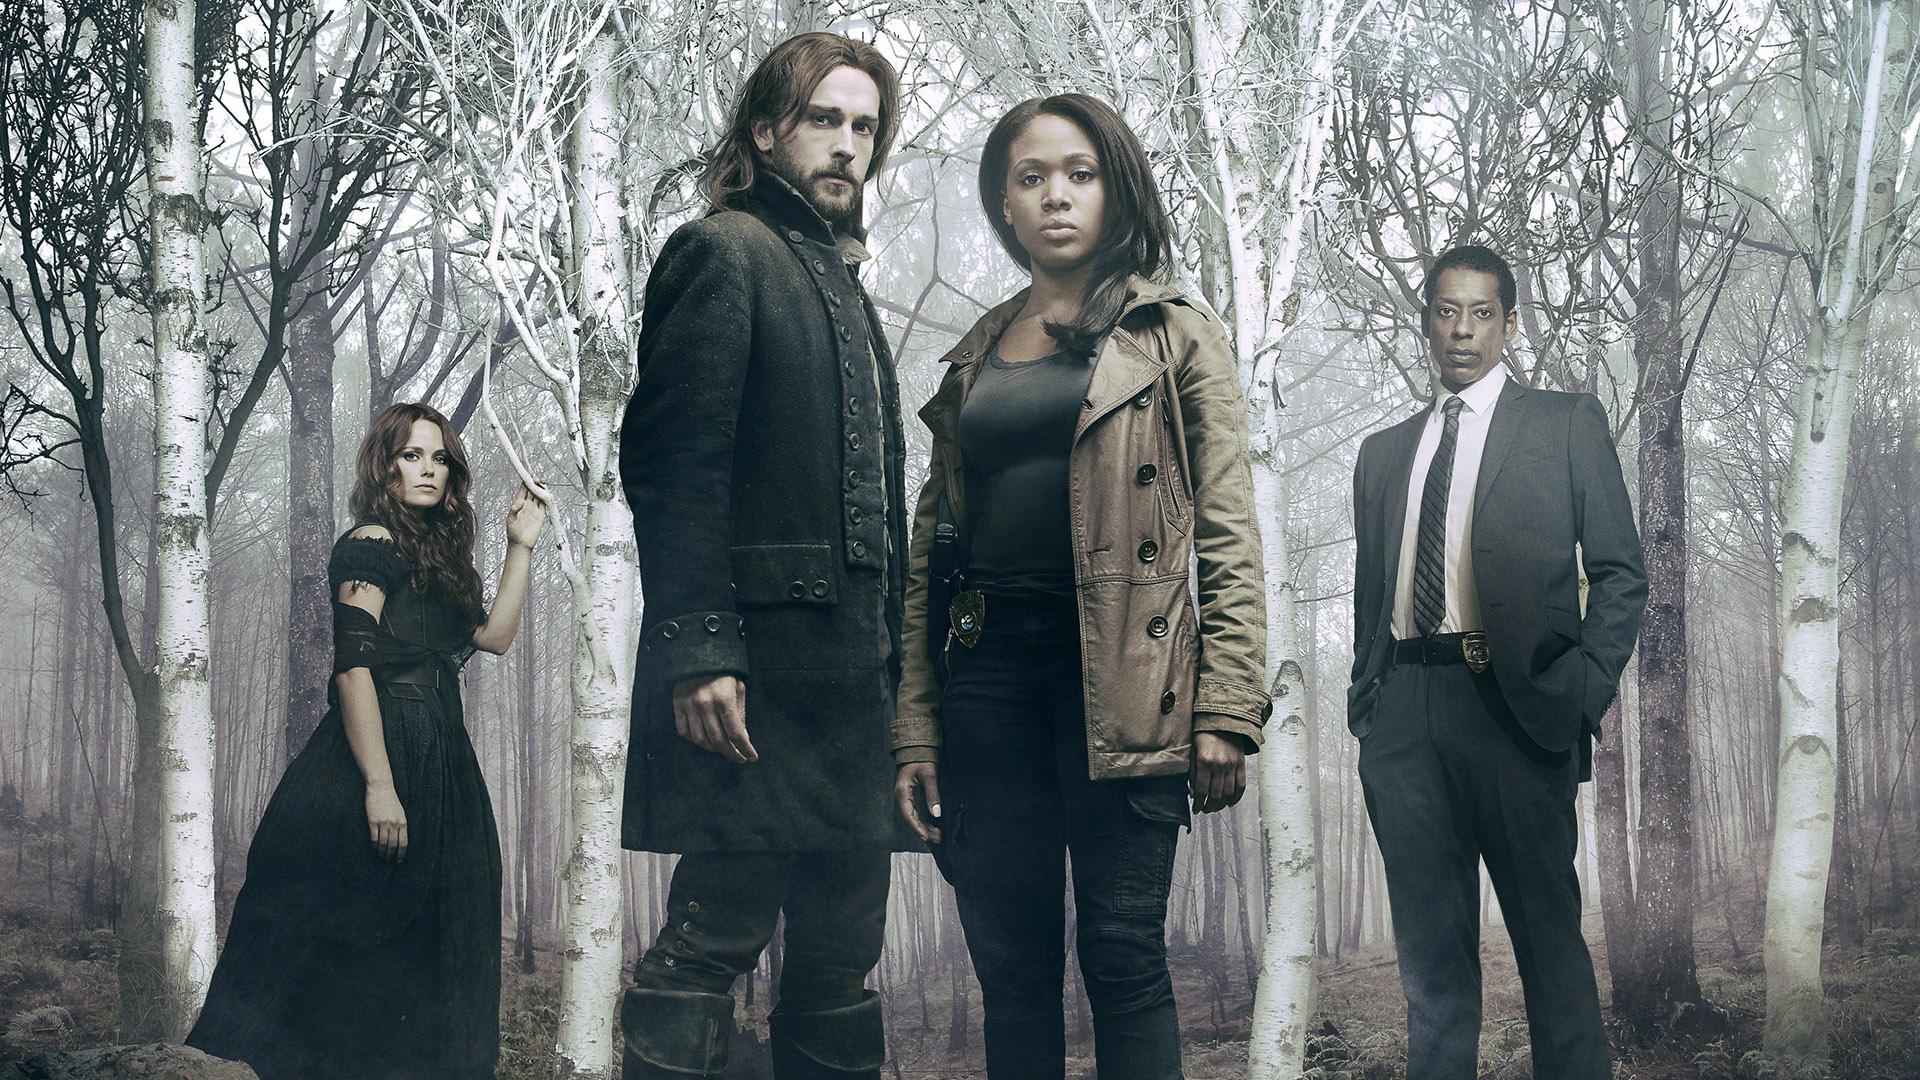 Fox announces premiere date Sleepy Hollow